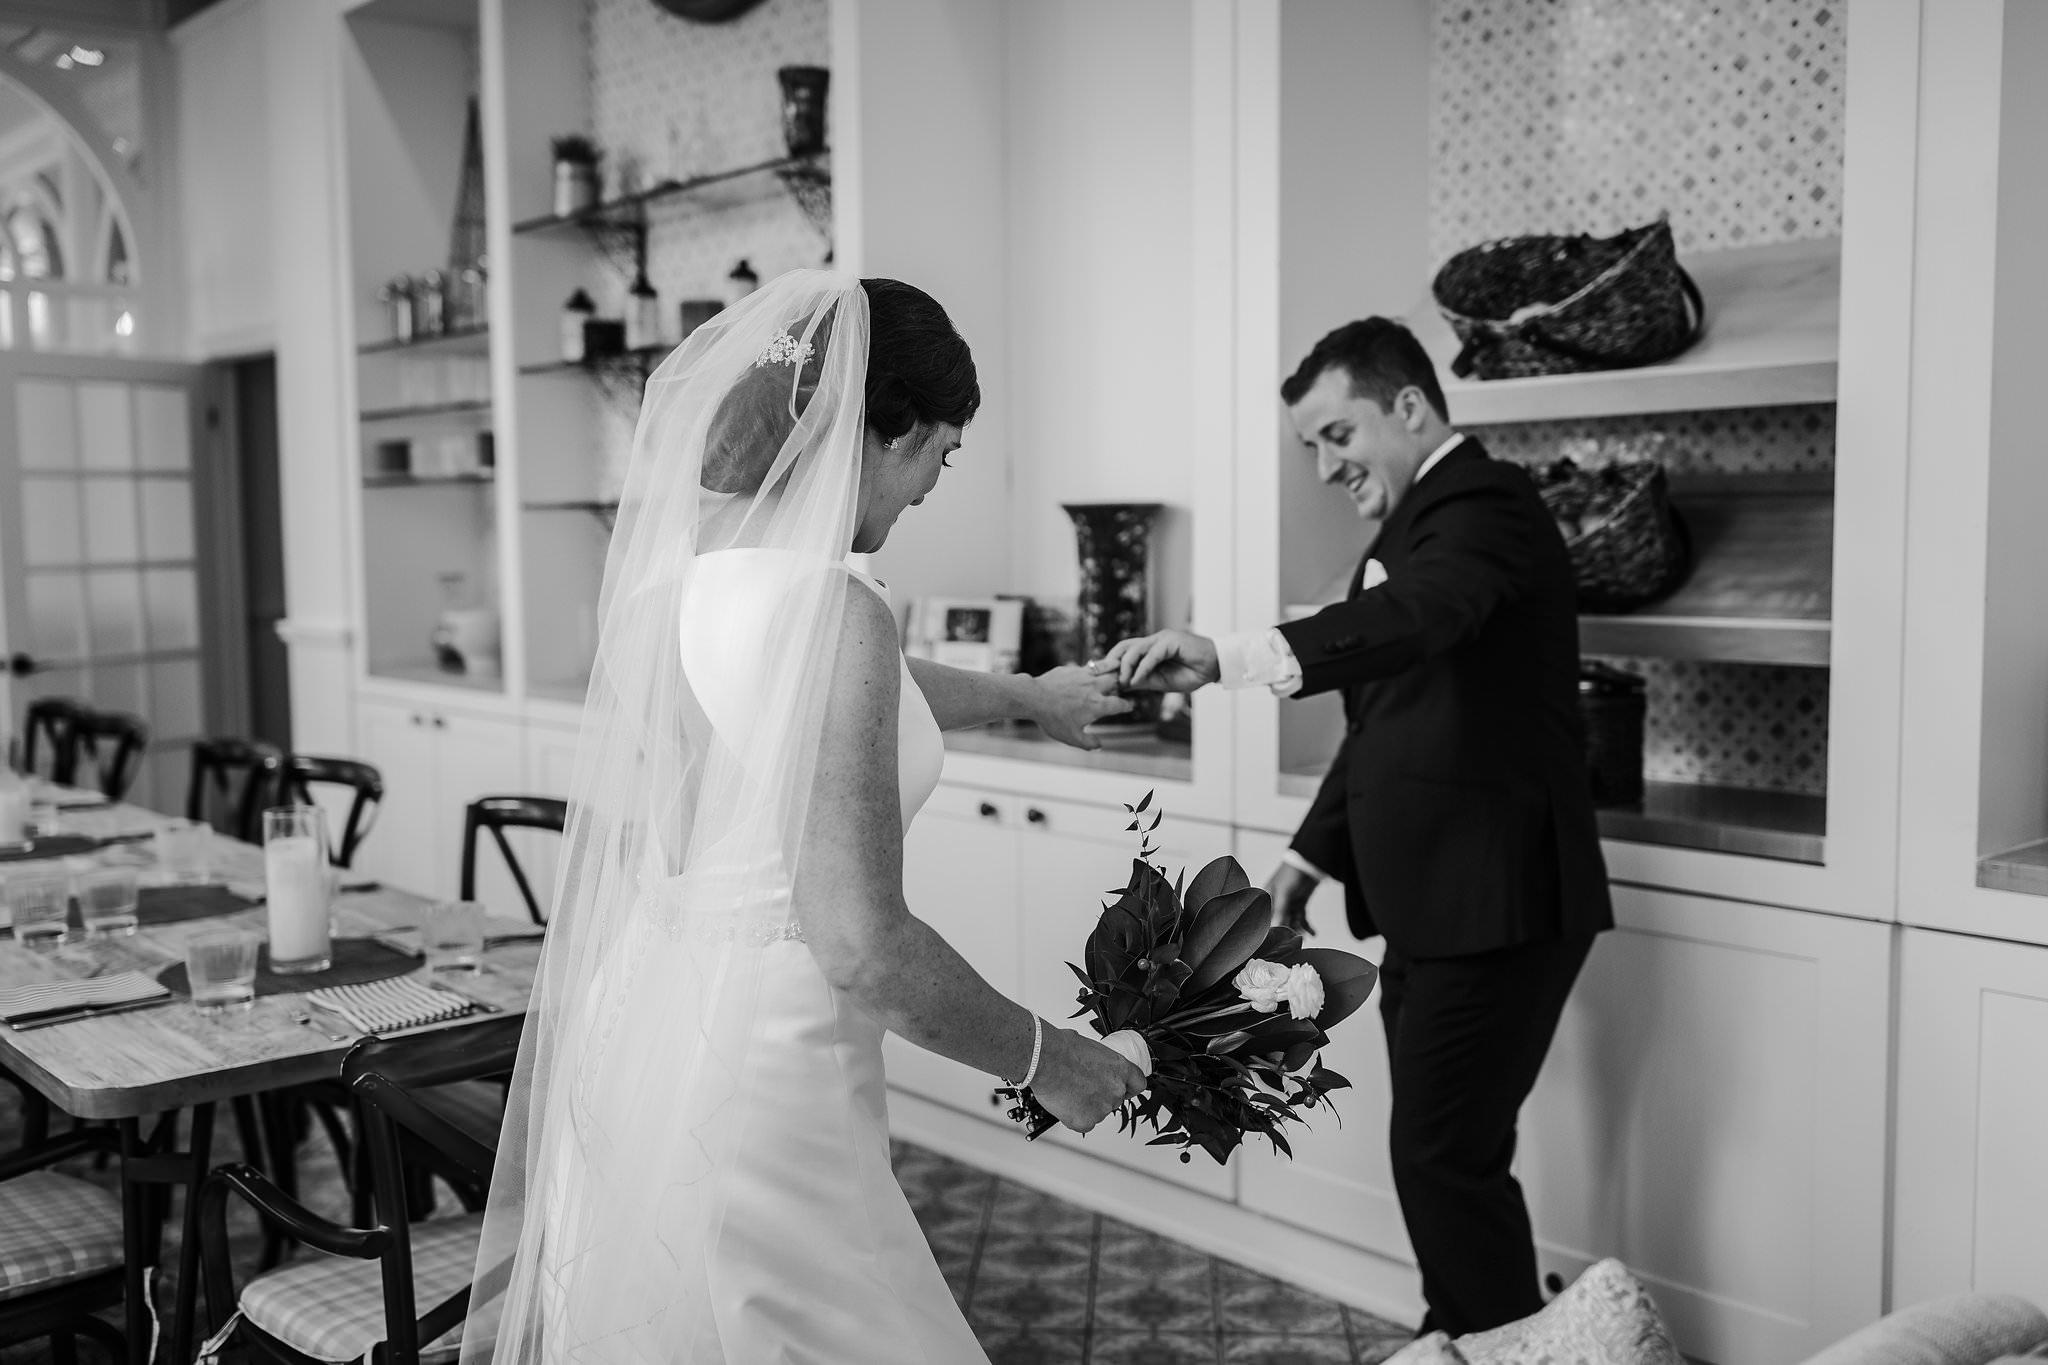 Cristin Rob Thompson Hotel Wedding Photos 235 - Thompson Hotel Wedding Photos